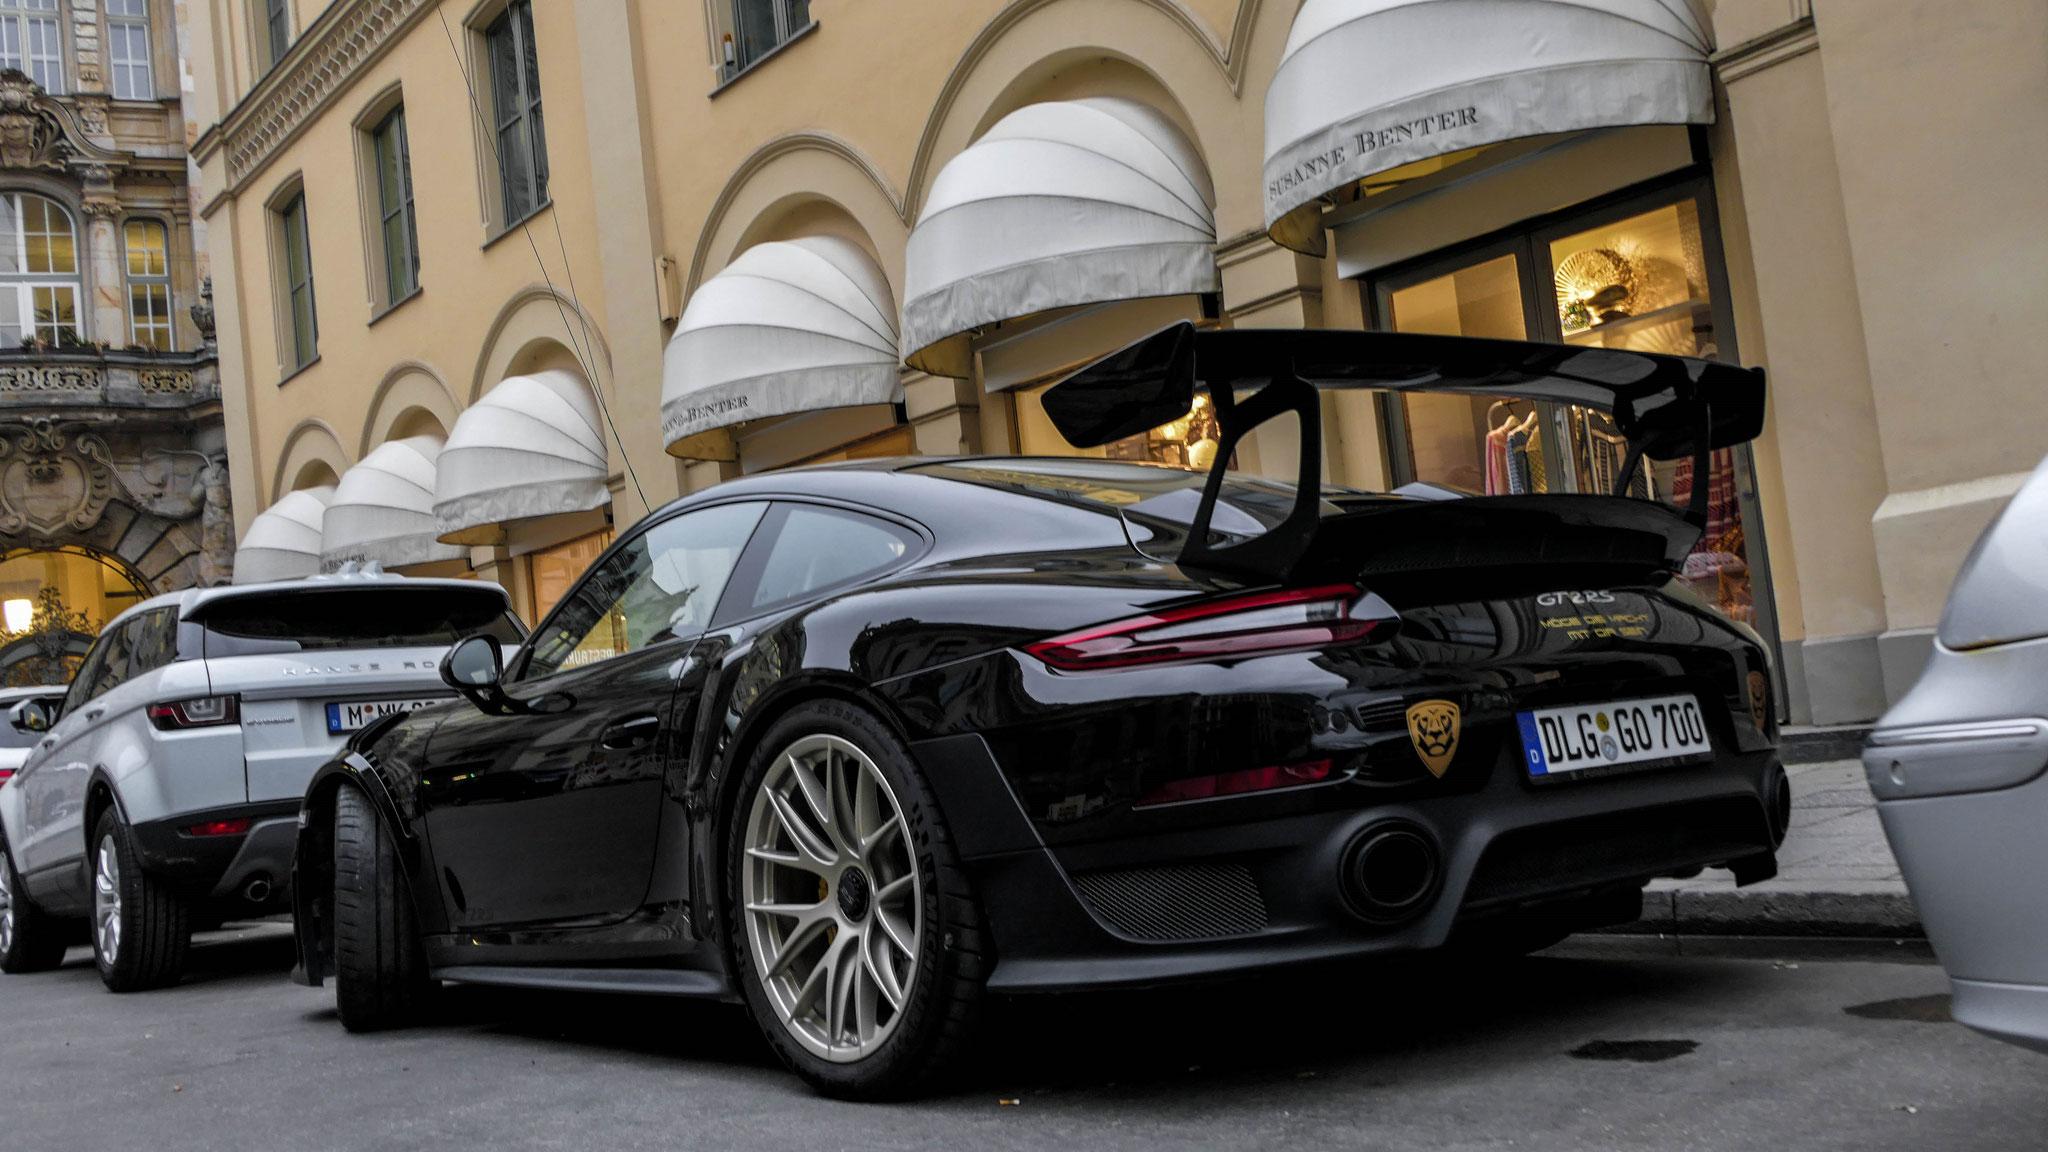 Porsche GT2 RS - DLG-GO-700